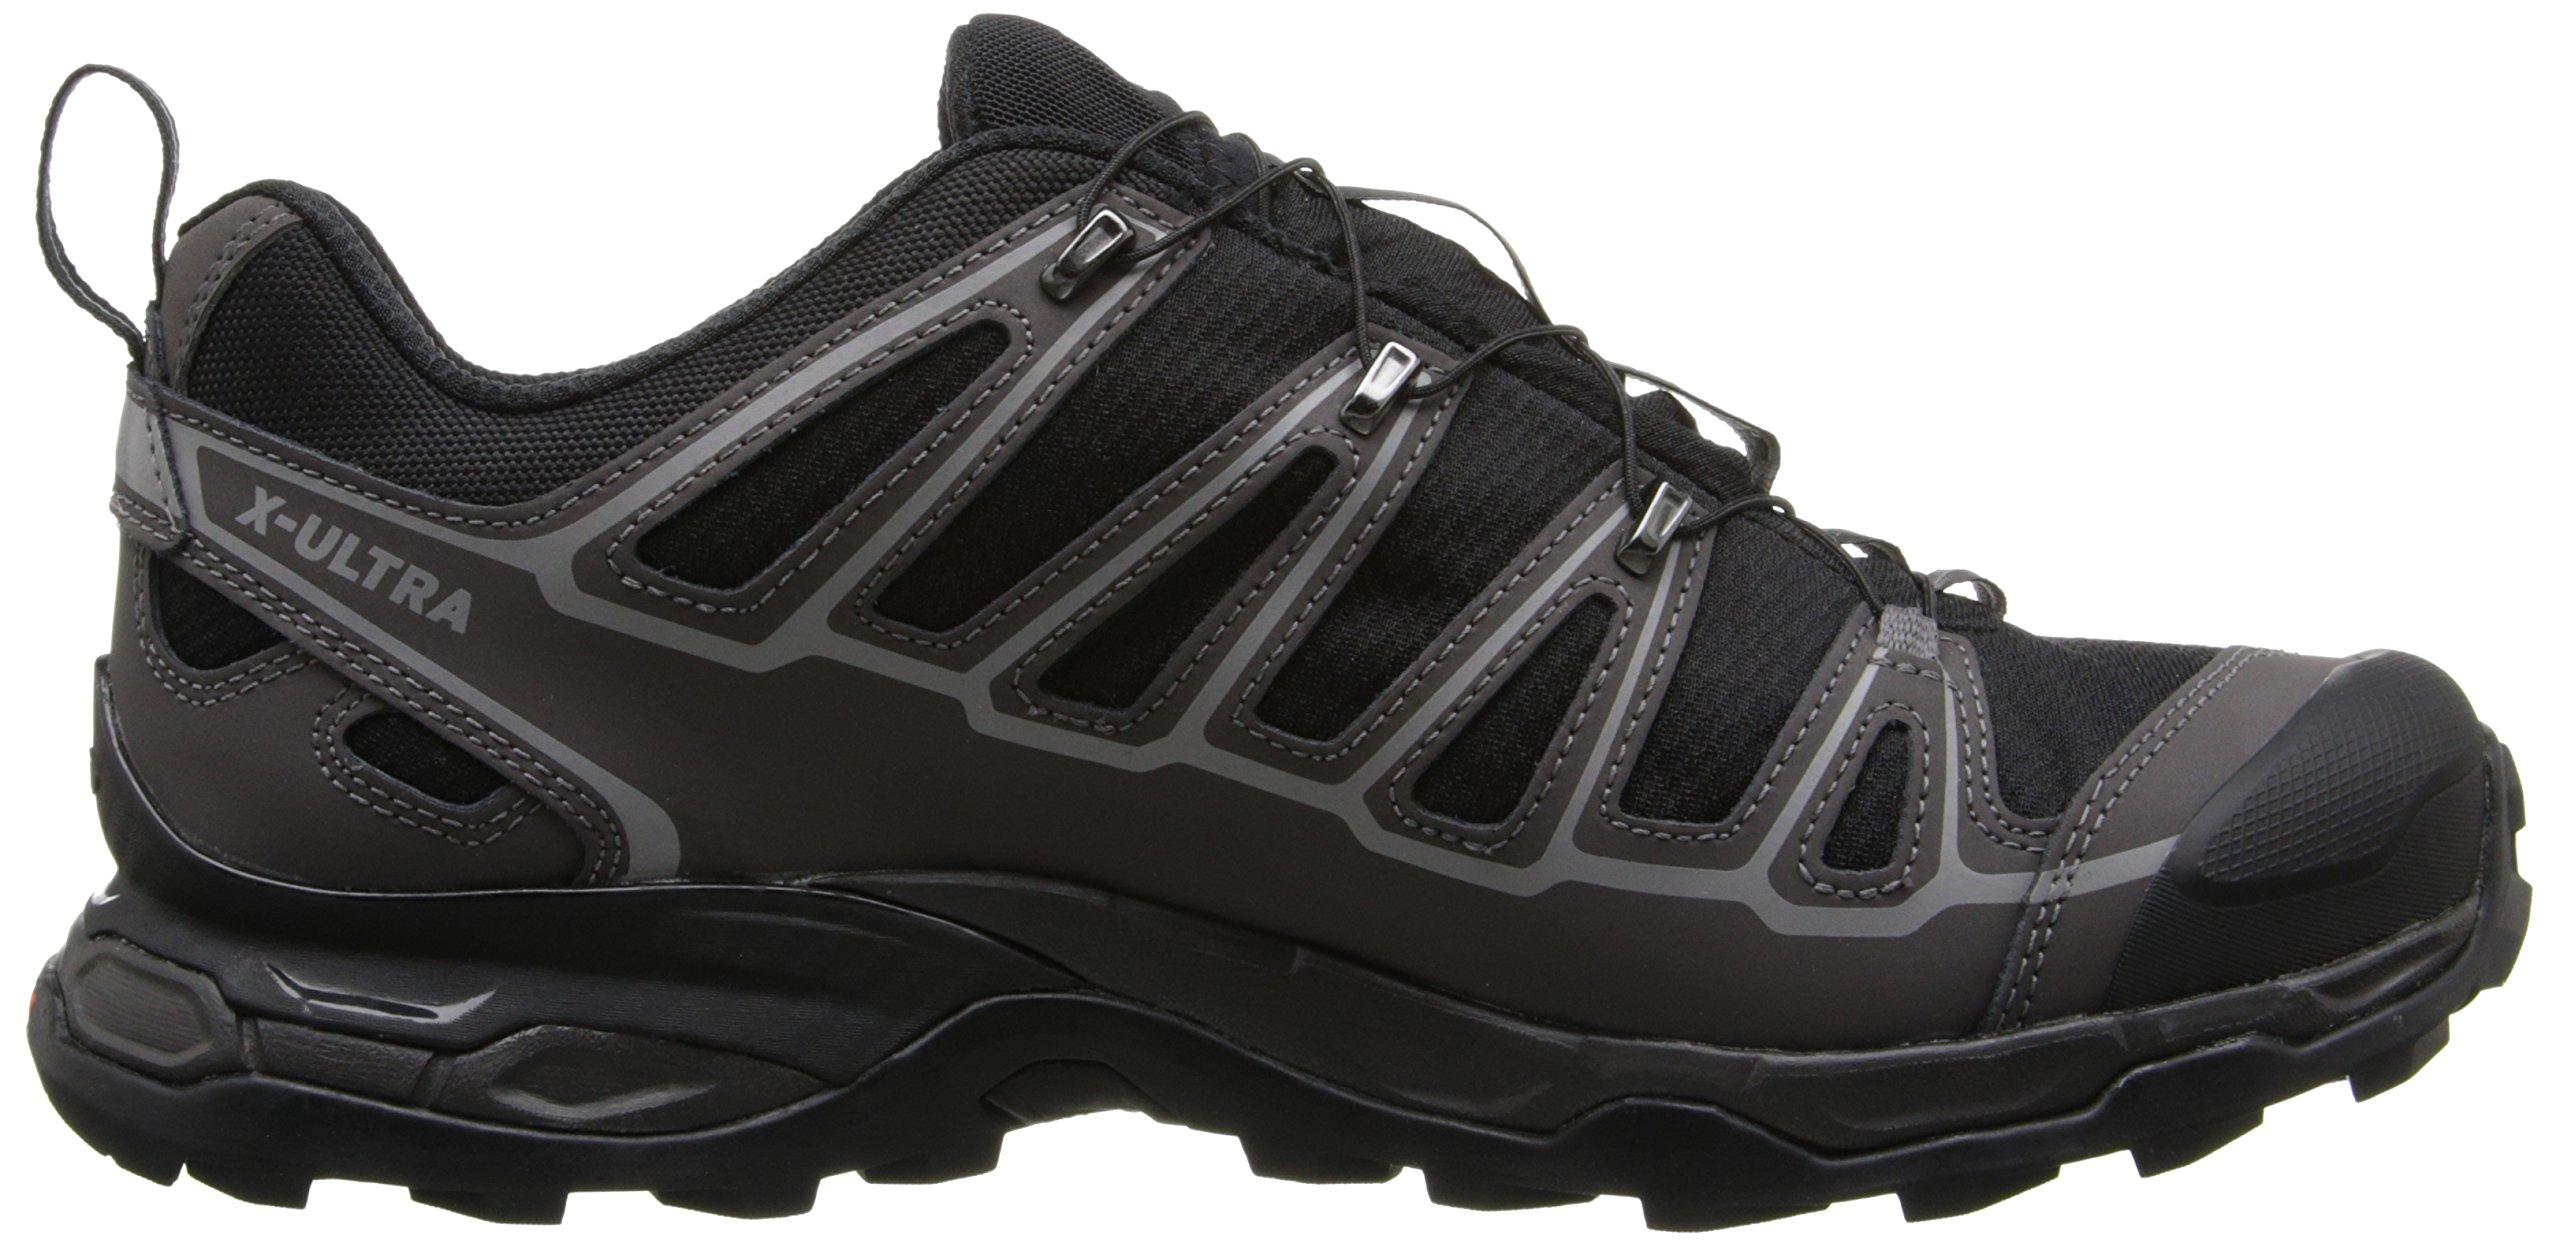 Salomon Men's X Ultra 2 GTX Hiking Shoe, Black/Autobahn/Aluminum, 7 M US by Salomon (Image #7)